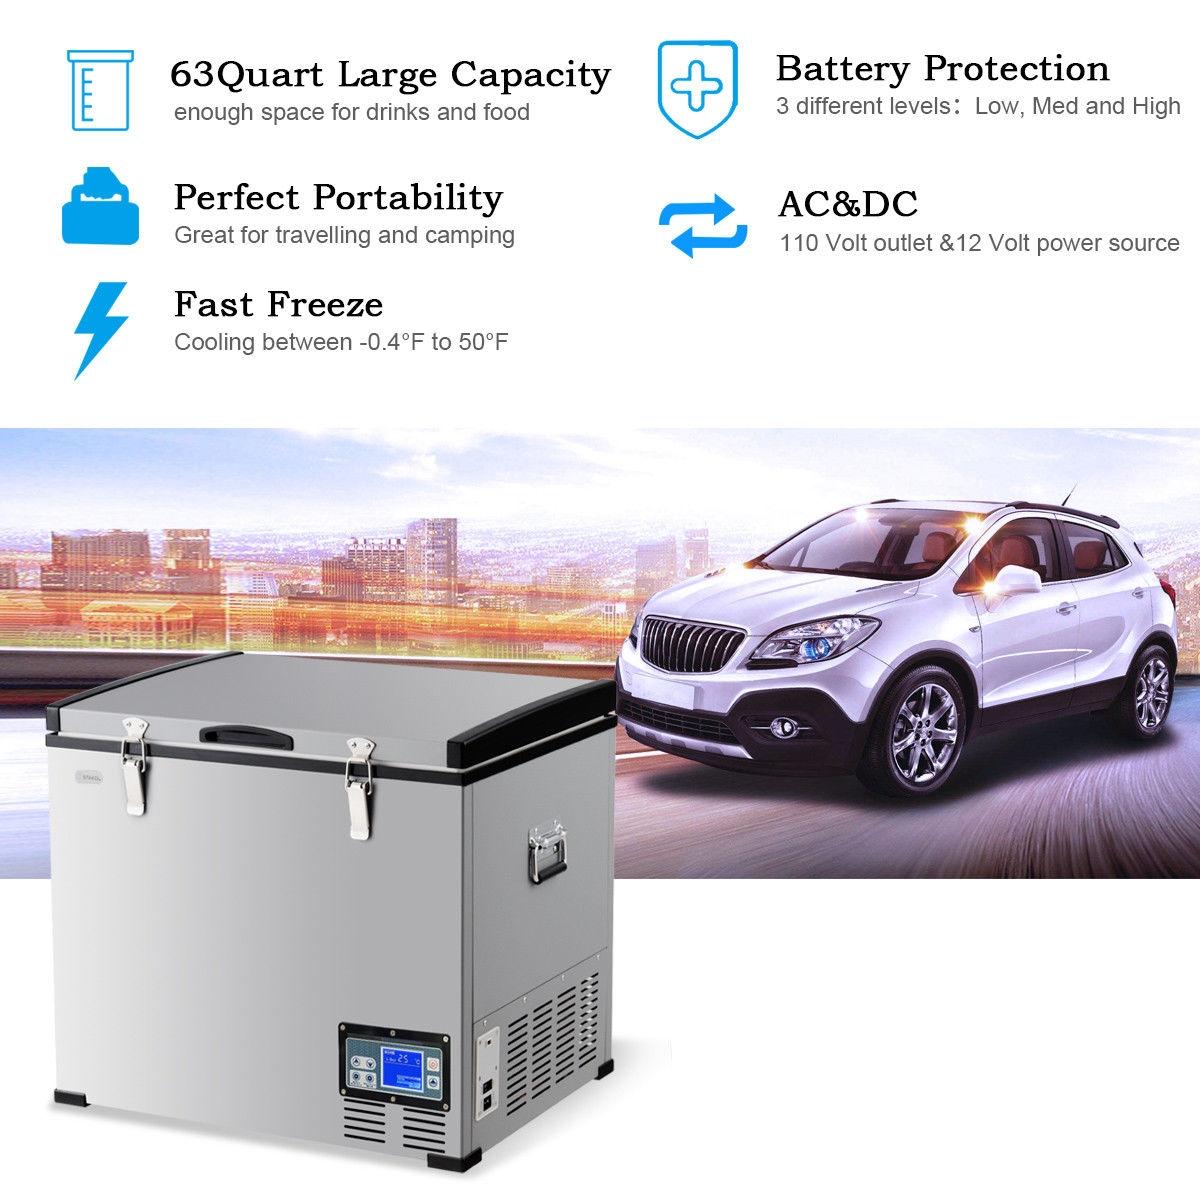 63-Quart Portable Electric Car Cooler Refrigerator Freezer